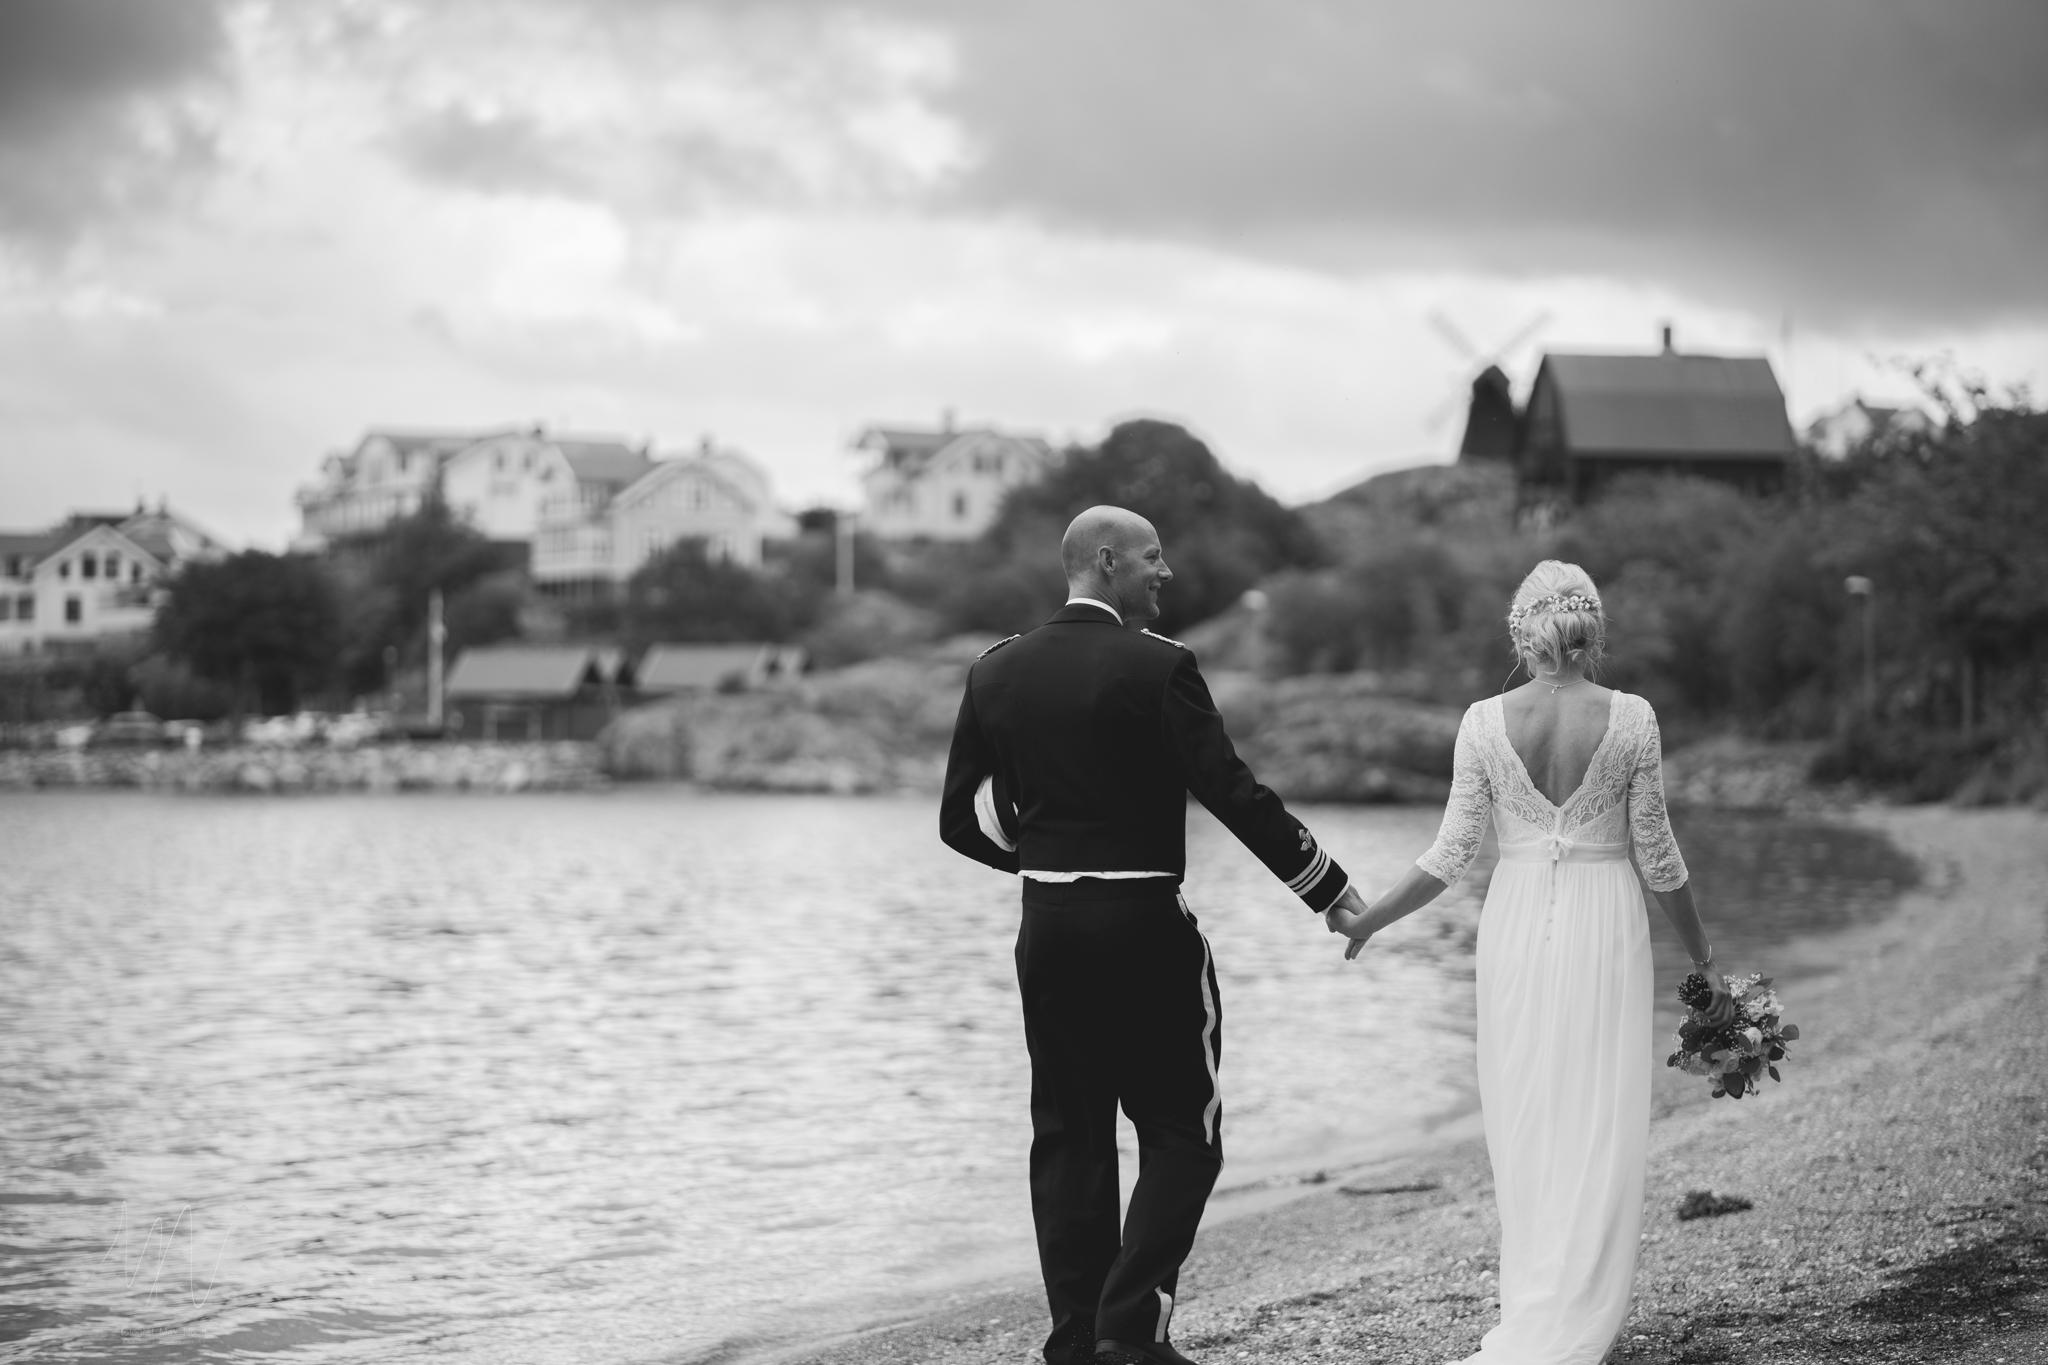 Bröllop-fotografmaxnorin.se-MariaMarcus-394.JPG